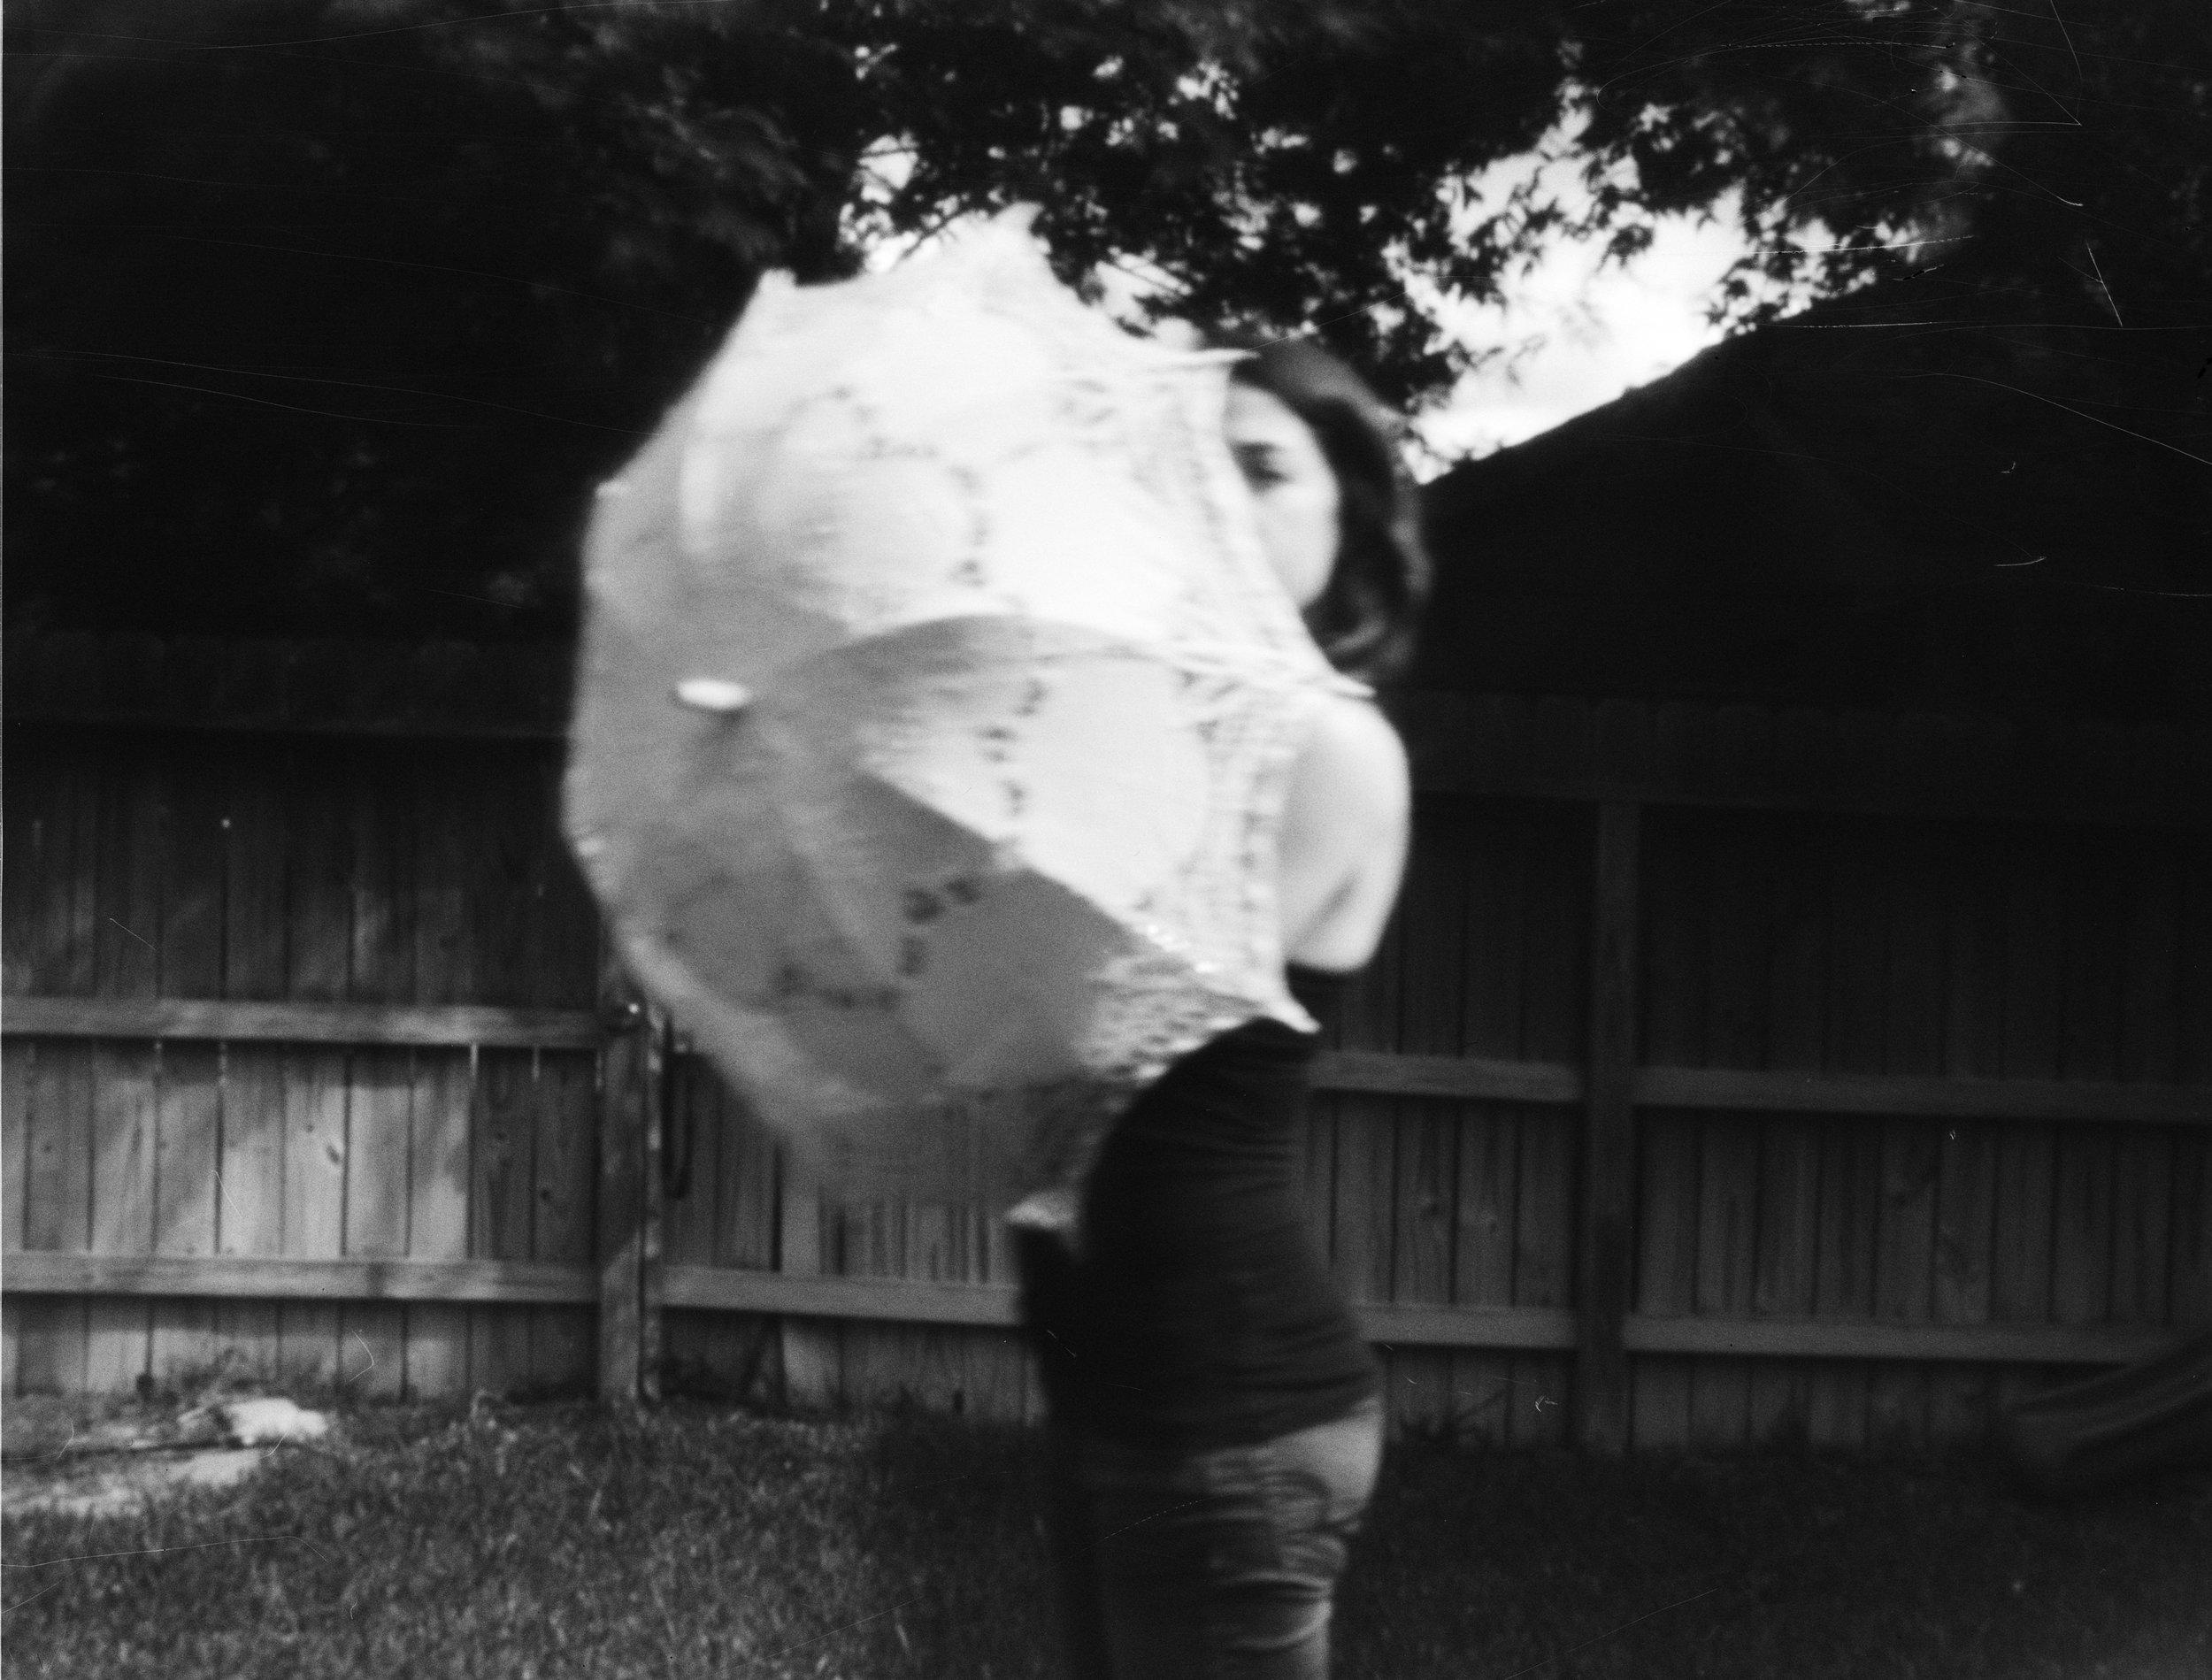 pinhole self with parasol 4x5 (1 of 1).jpg